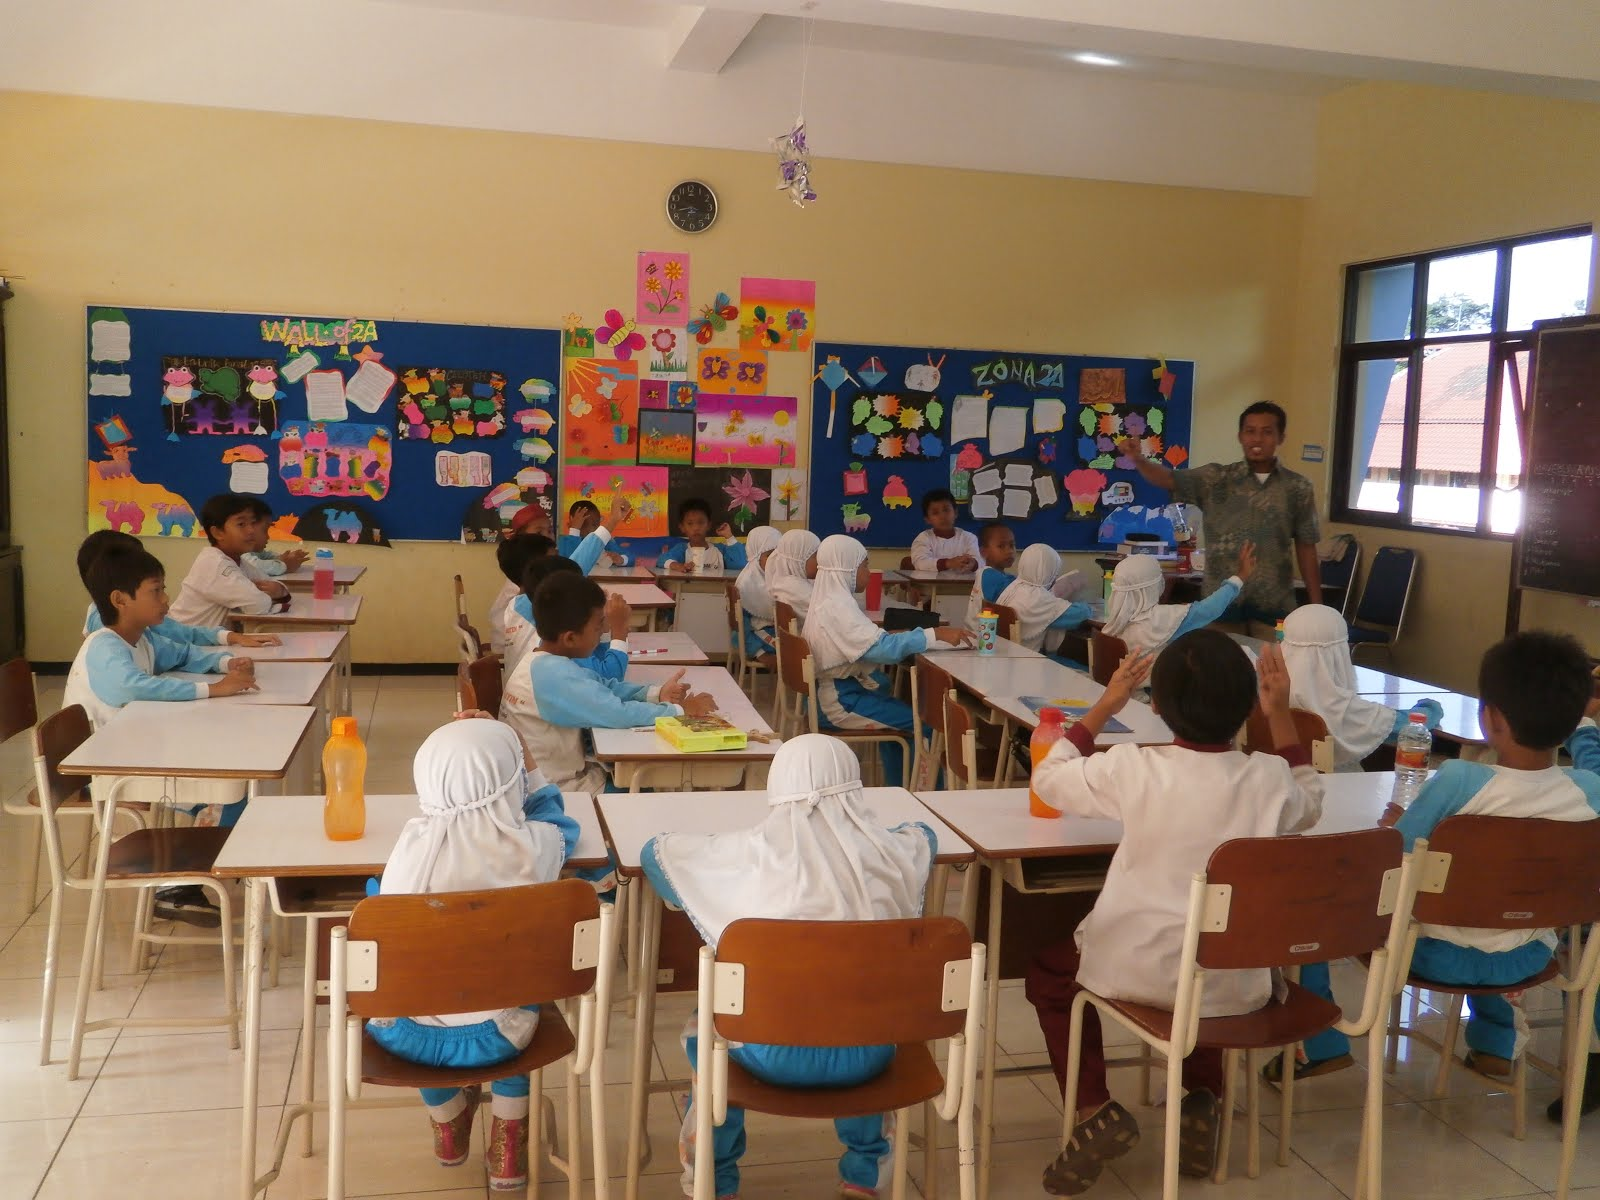 Pengelolaan Kelas Dan Variasi Mengajar Warta Madrasah